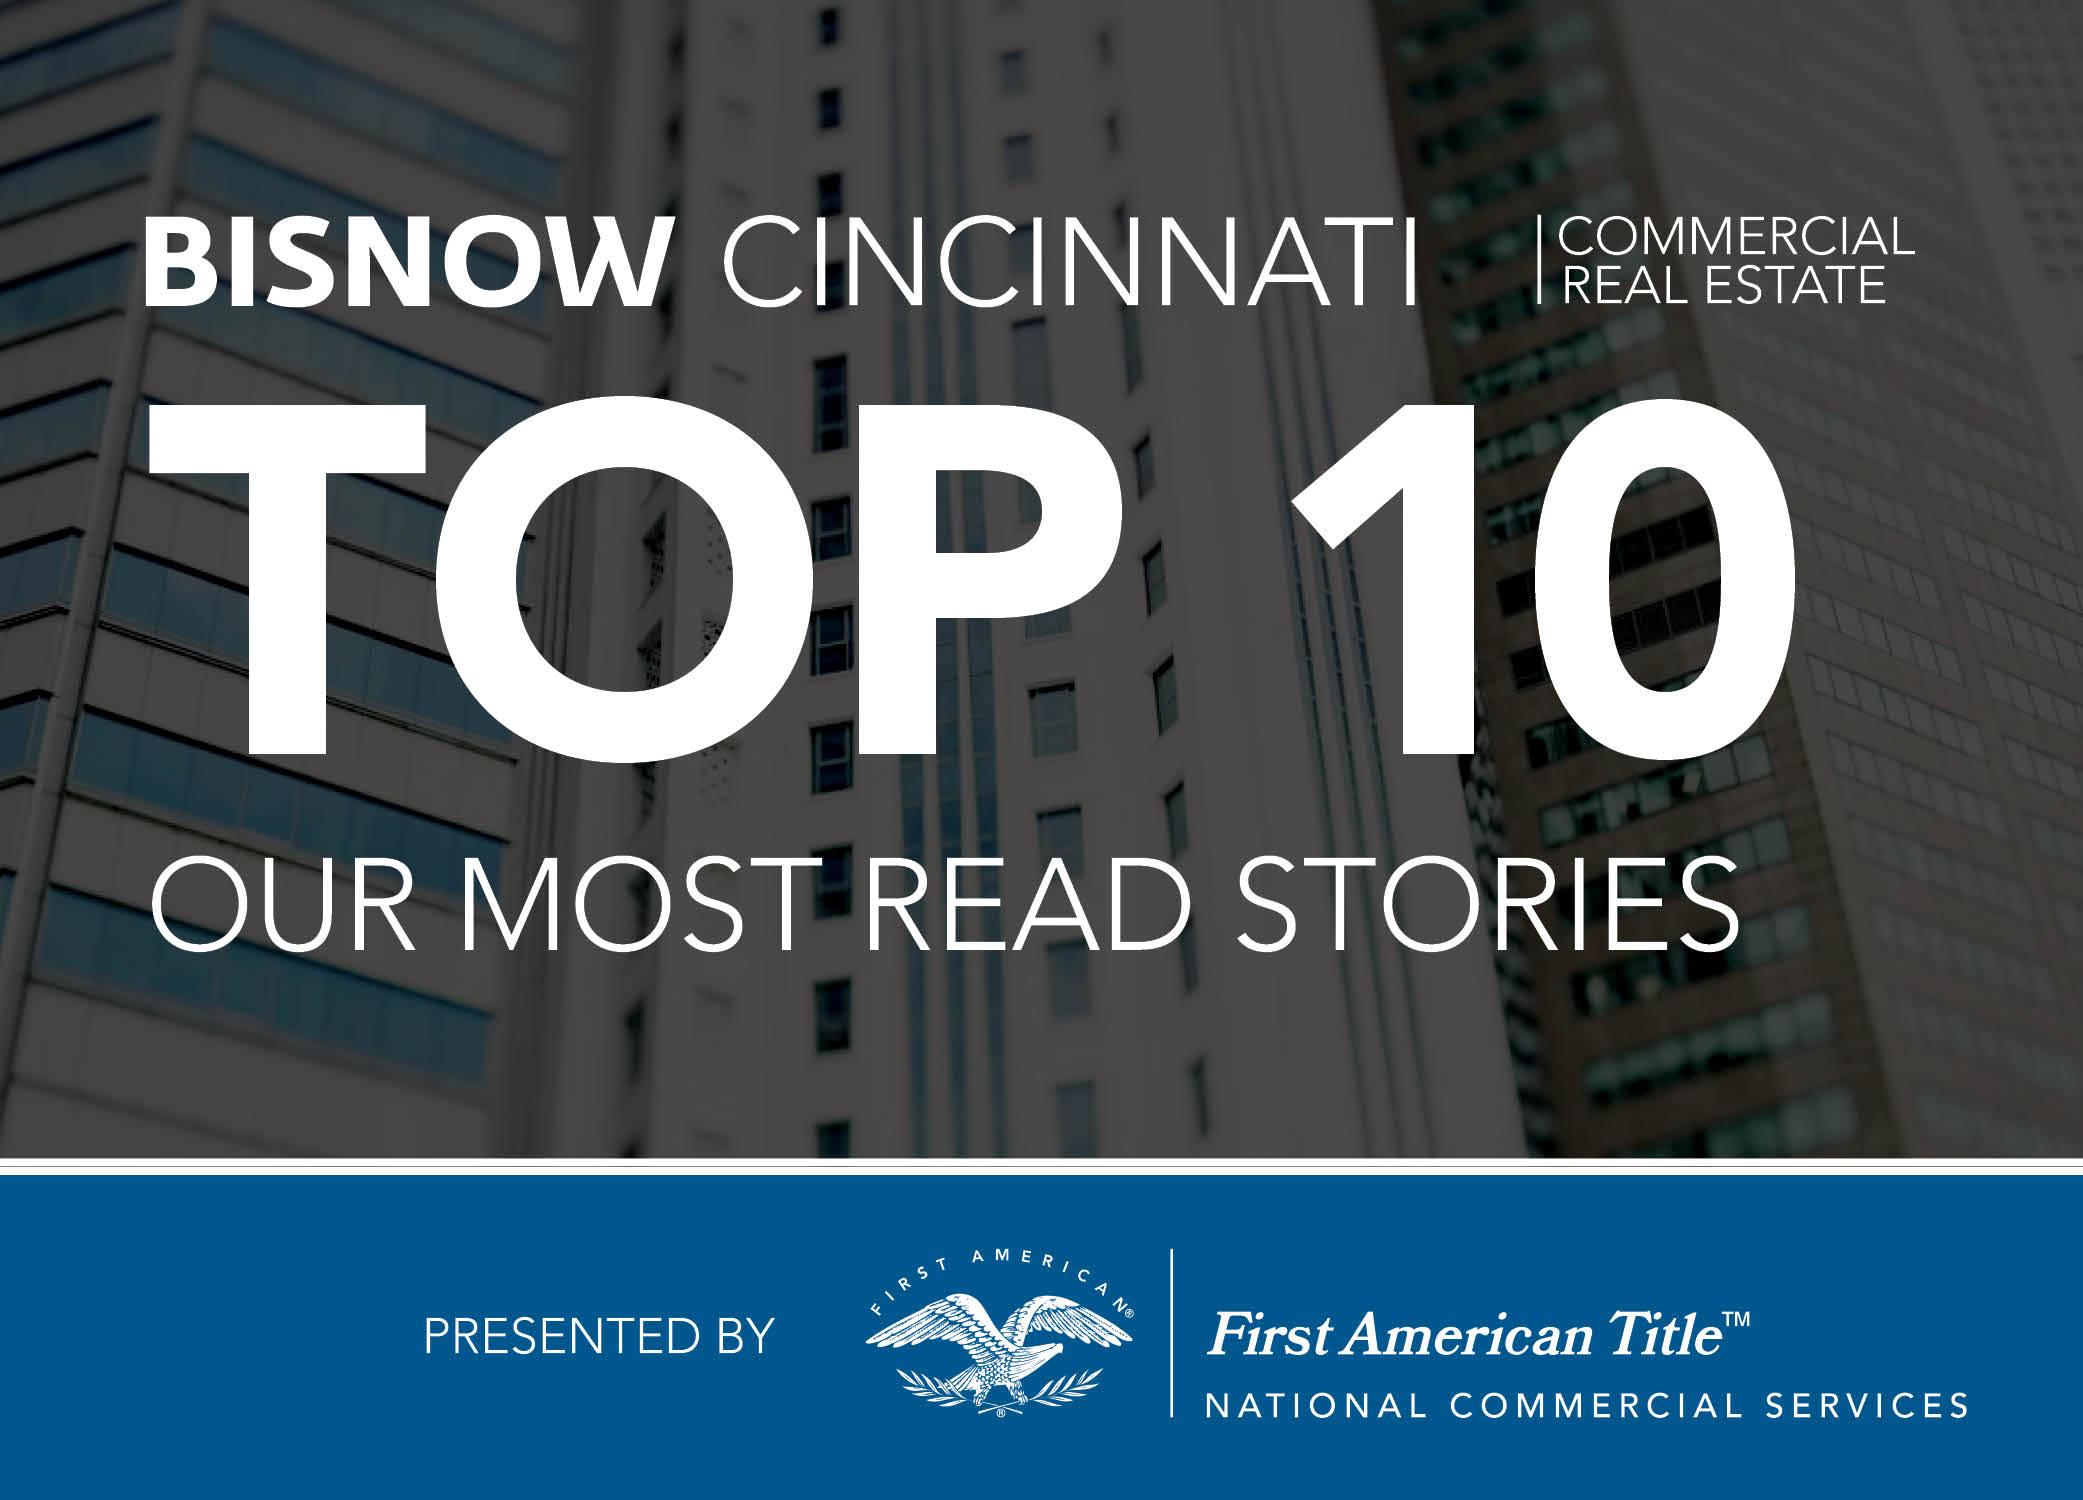 Bisnow Morning Brief Cincinnati